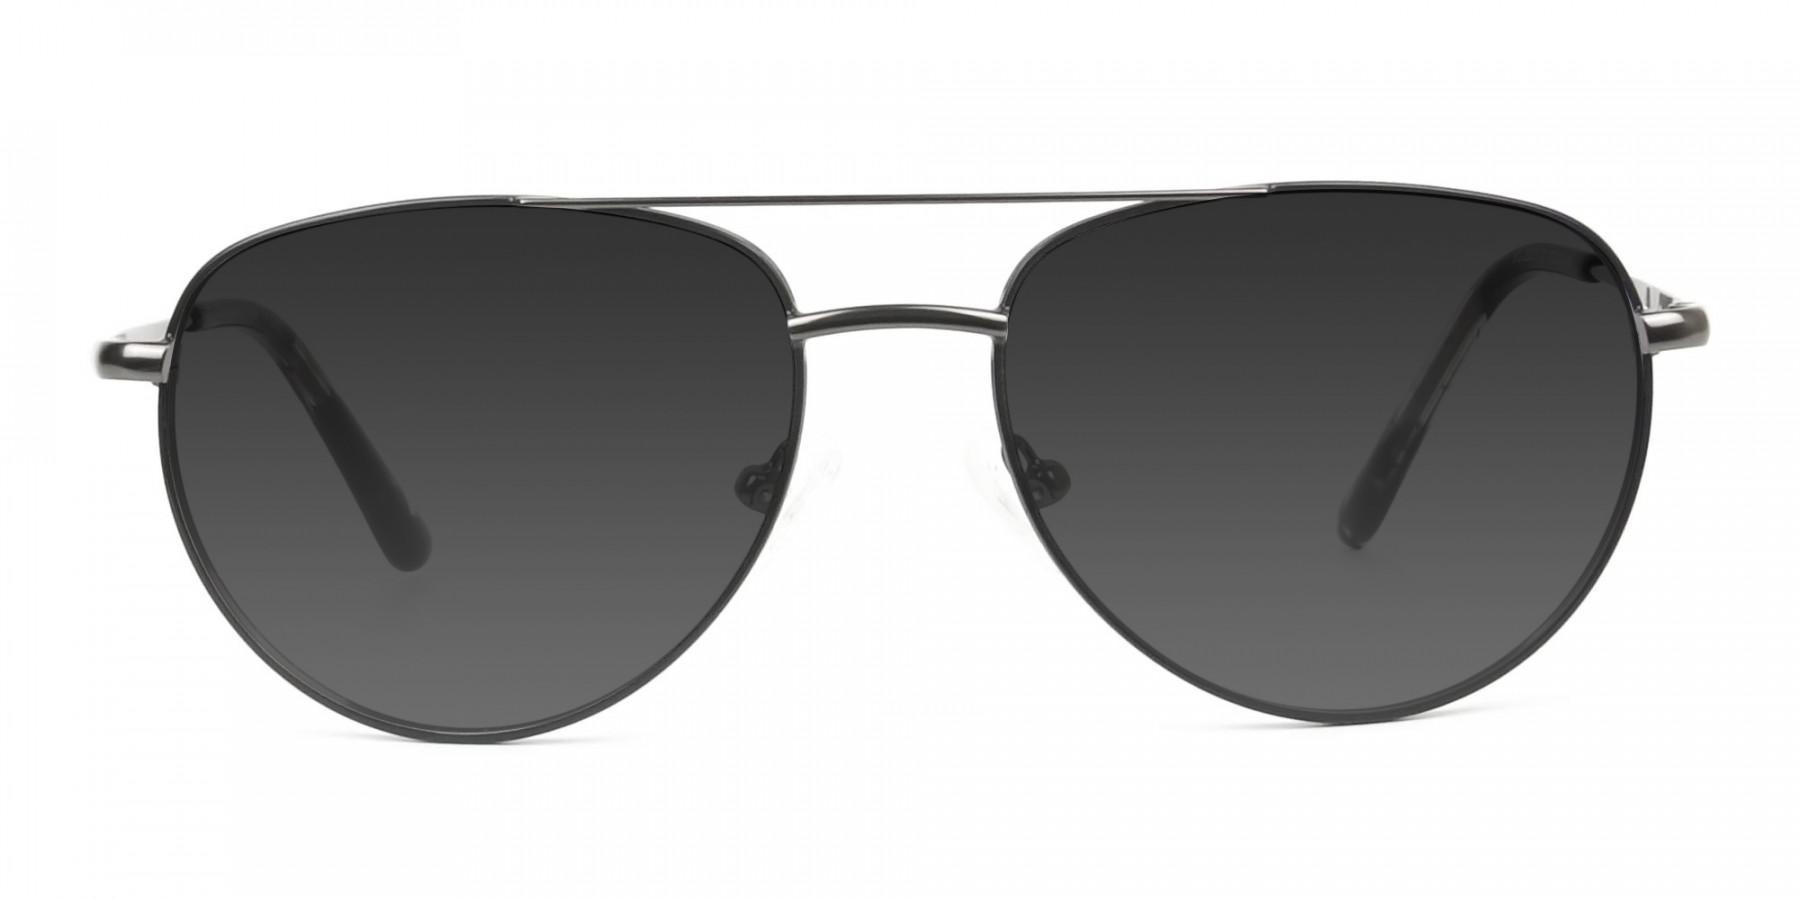 Grey Tinted Dark Navy Blue Aviator Sunglasses - 3